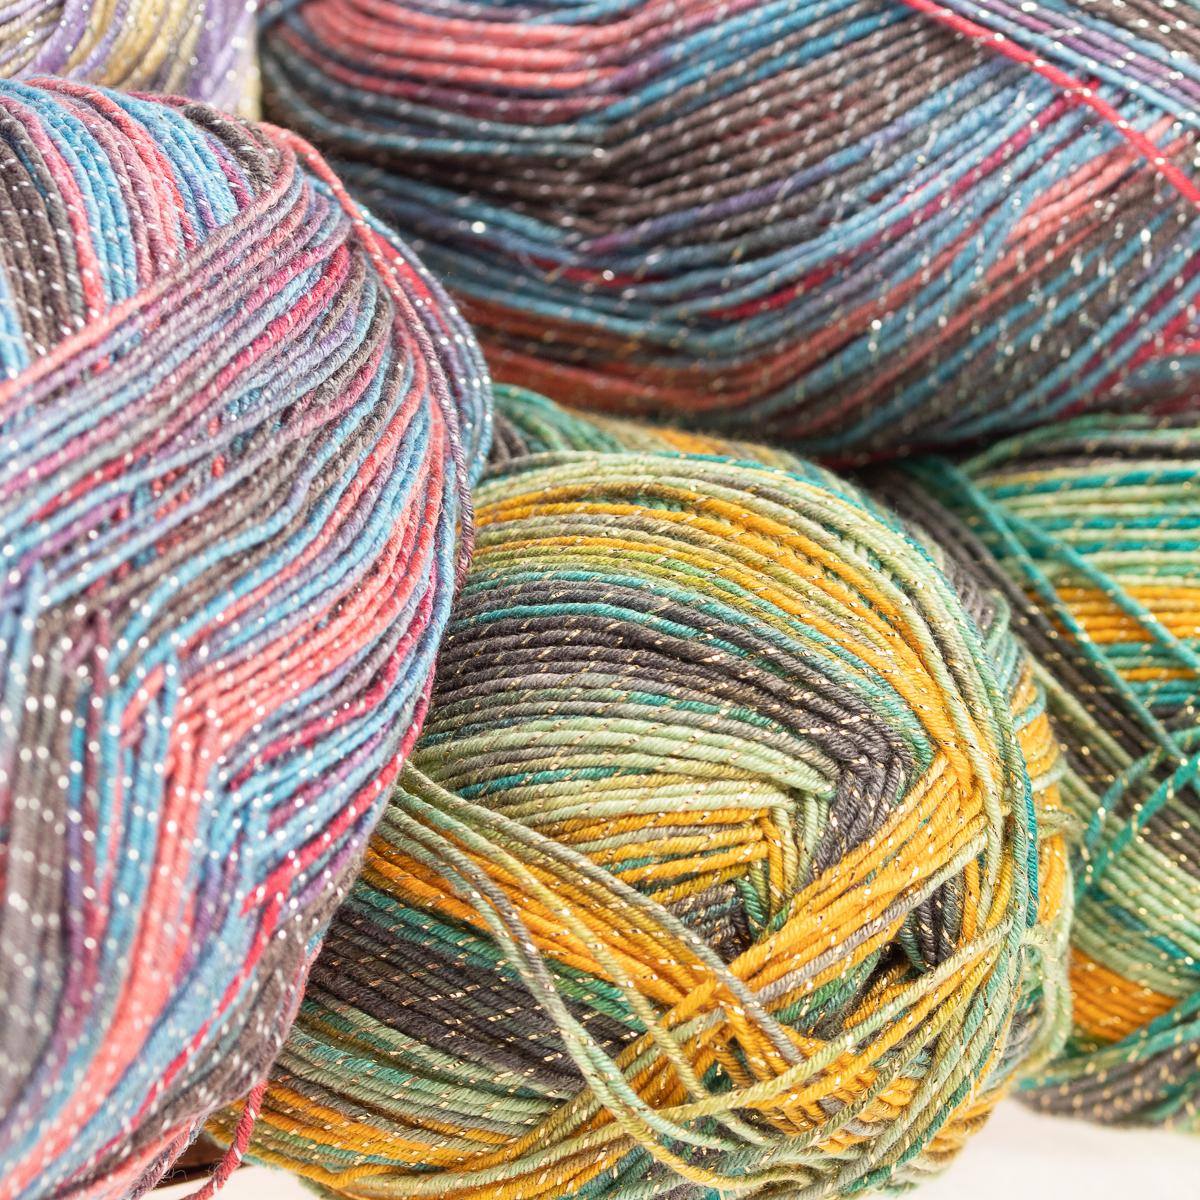 3pk-Premier-Yarns-Wool-Free-Lace-Acrylic-Yarn-Super-Fine-1-Knitting-Skeins-Soft thumbnail 16